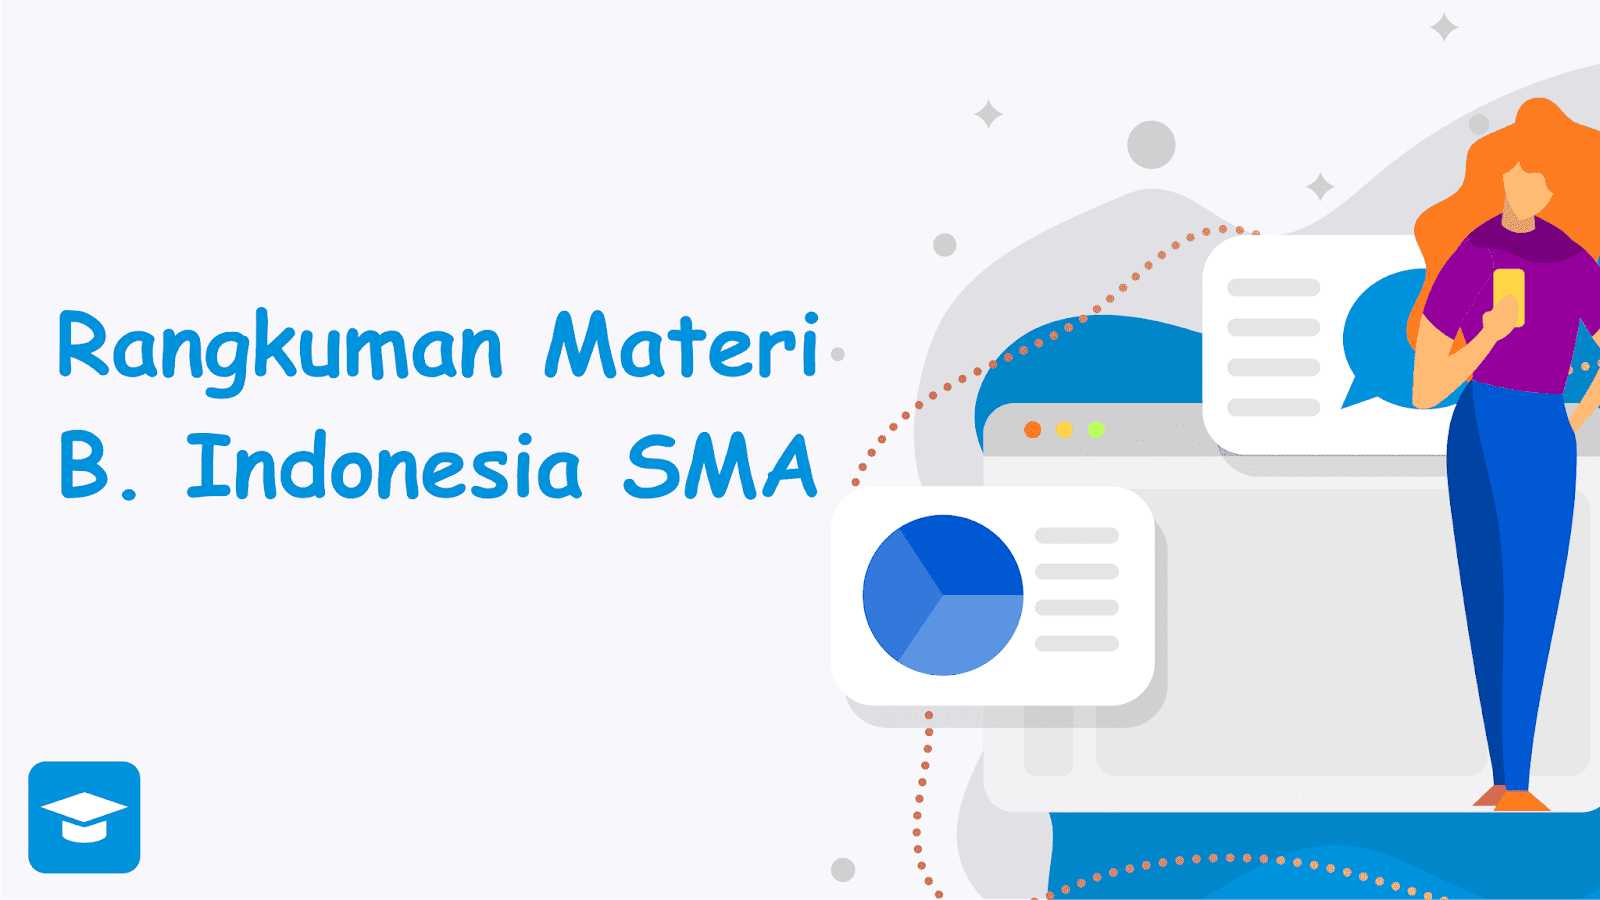 Rangkuman materi bahasa Indonesia